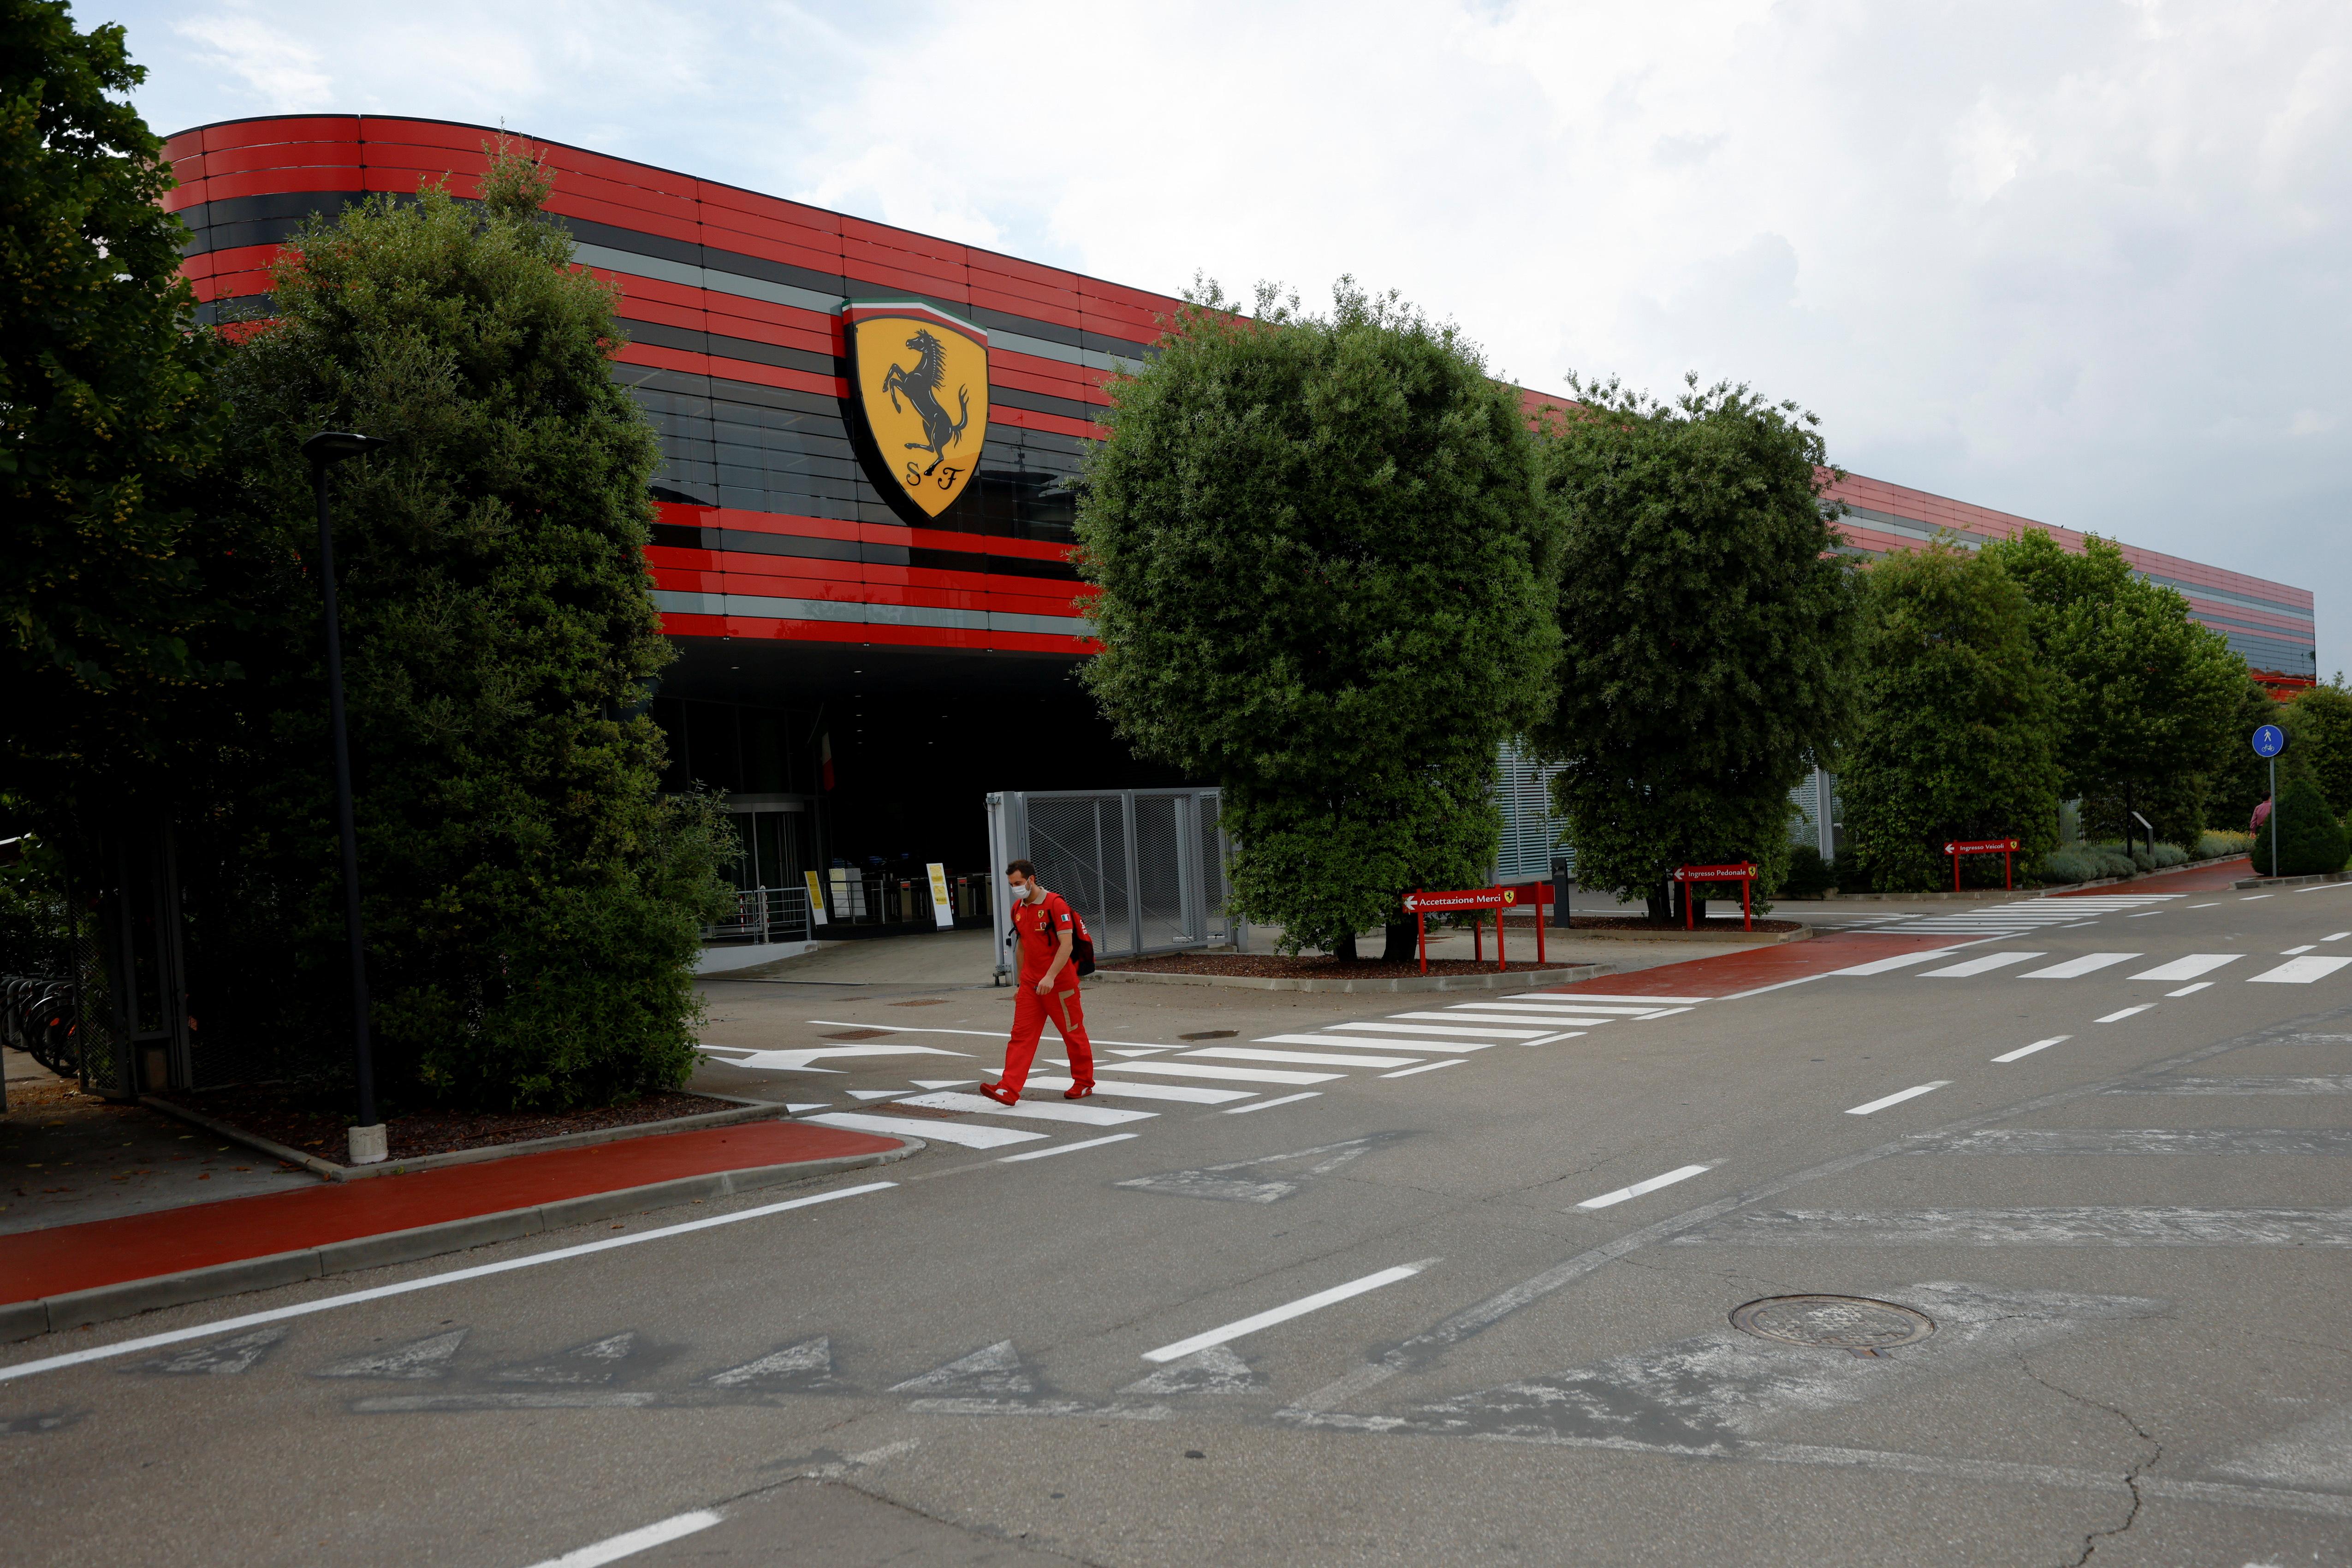 General view of Ferrari's headquarters in Maranello, Italy, June 8, 2021. Picture taken June 8, 2021. REUTERS/Guglielmo Mangiapane